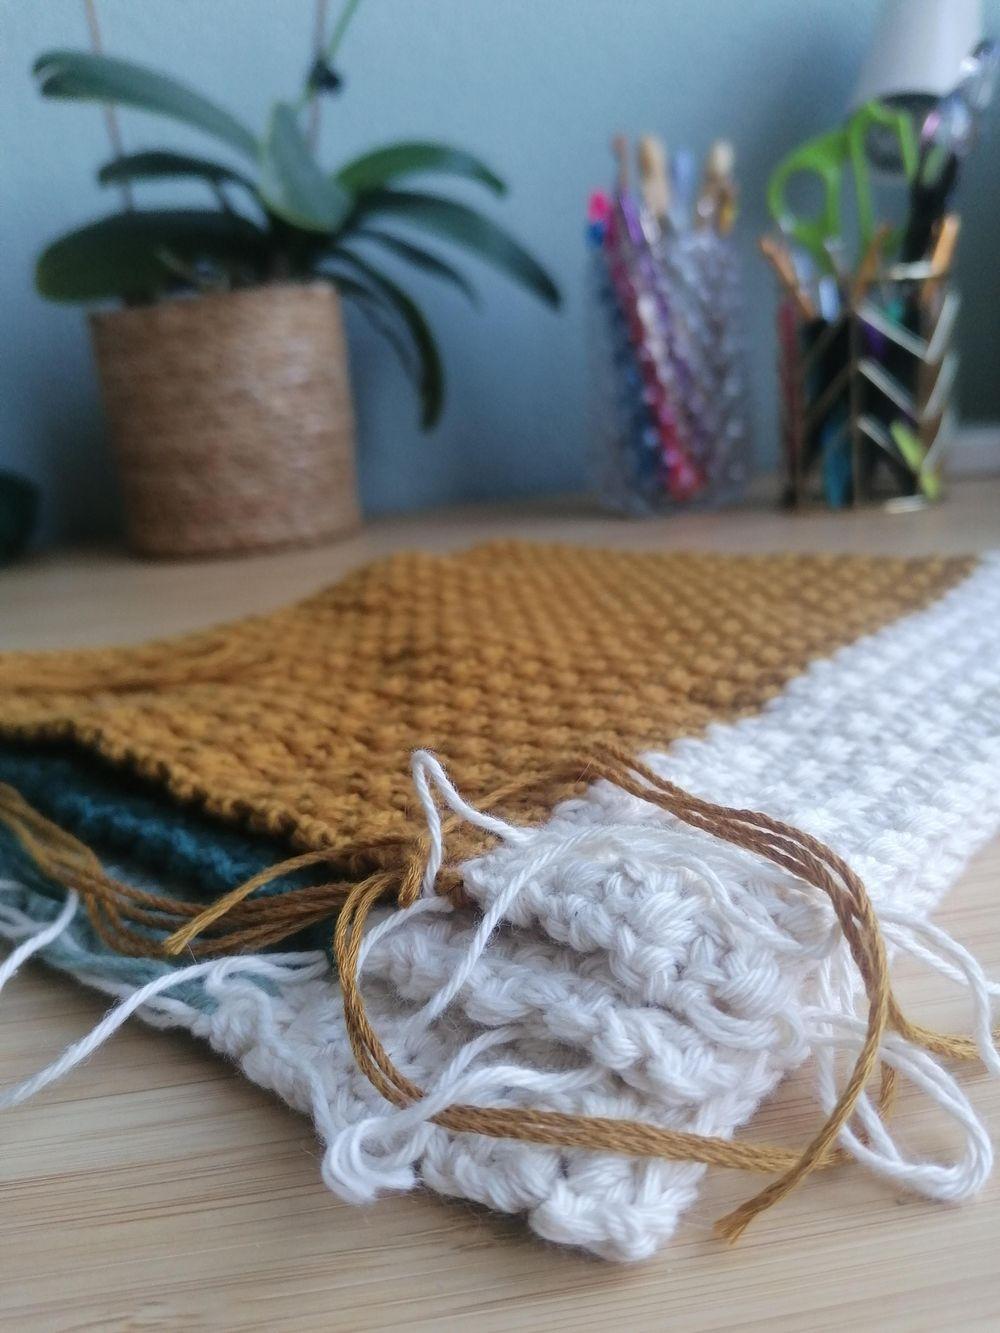 Crochet dishcloth - image 1 - student project